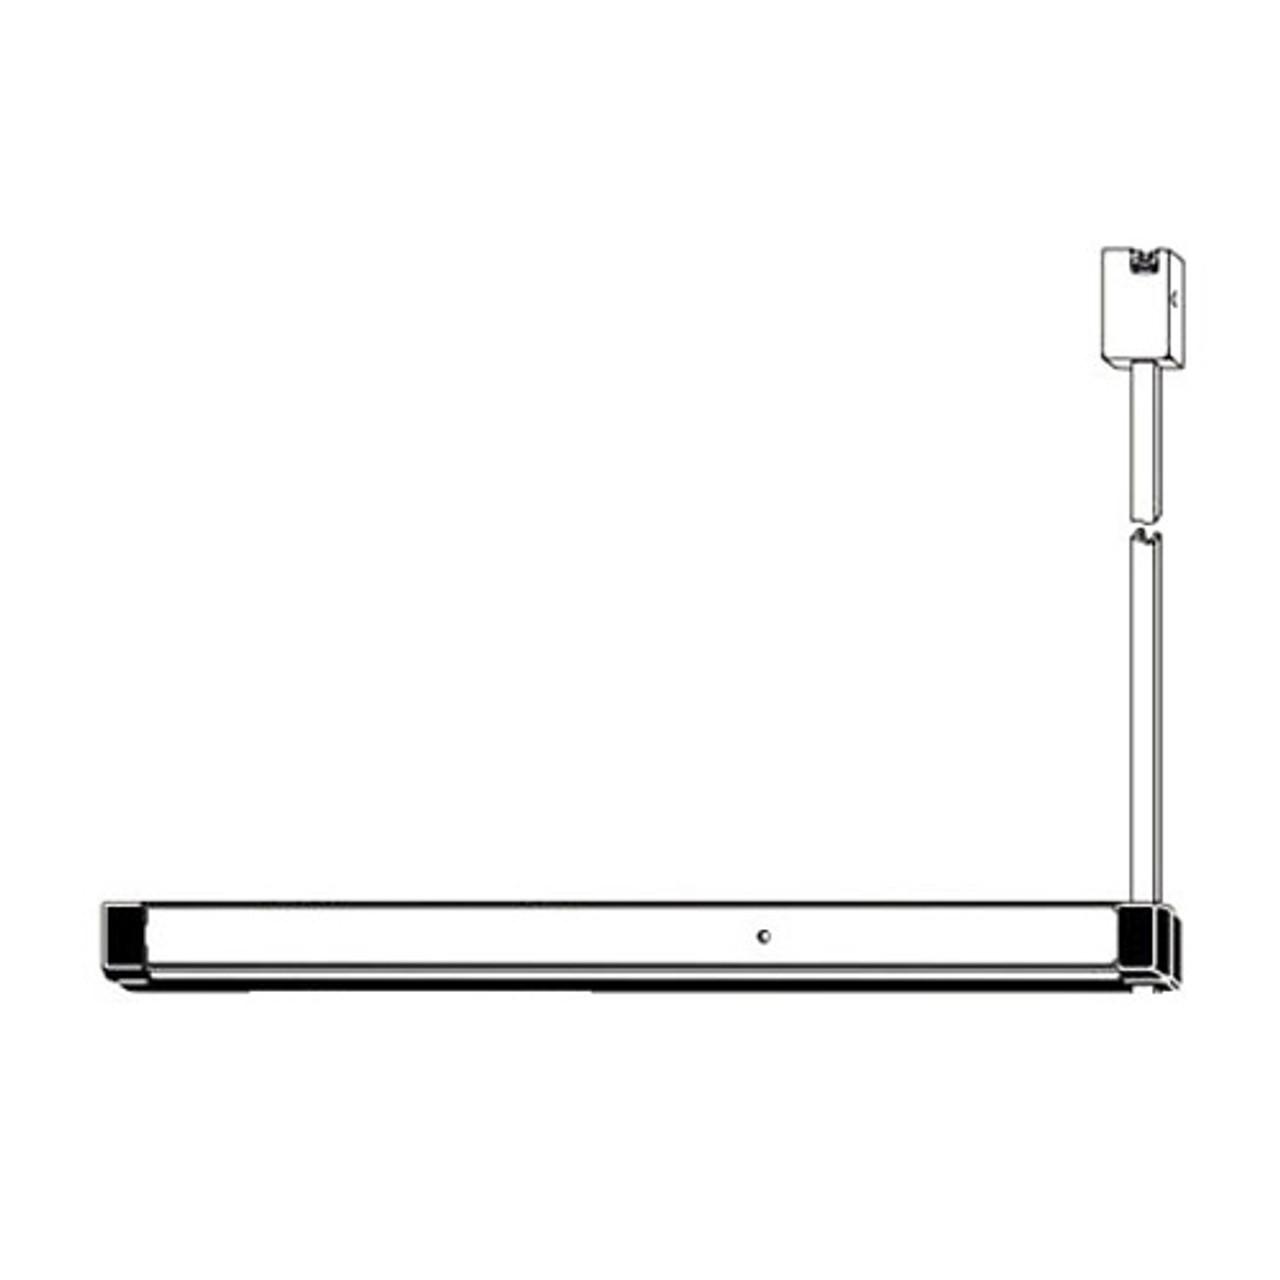 8222T-EDM-48 Adams Rite Narrow Stile Surface Vertical Rod Exit Device in Dark Bronze